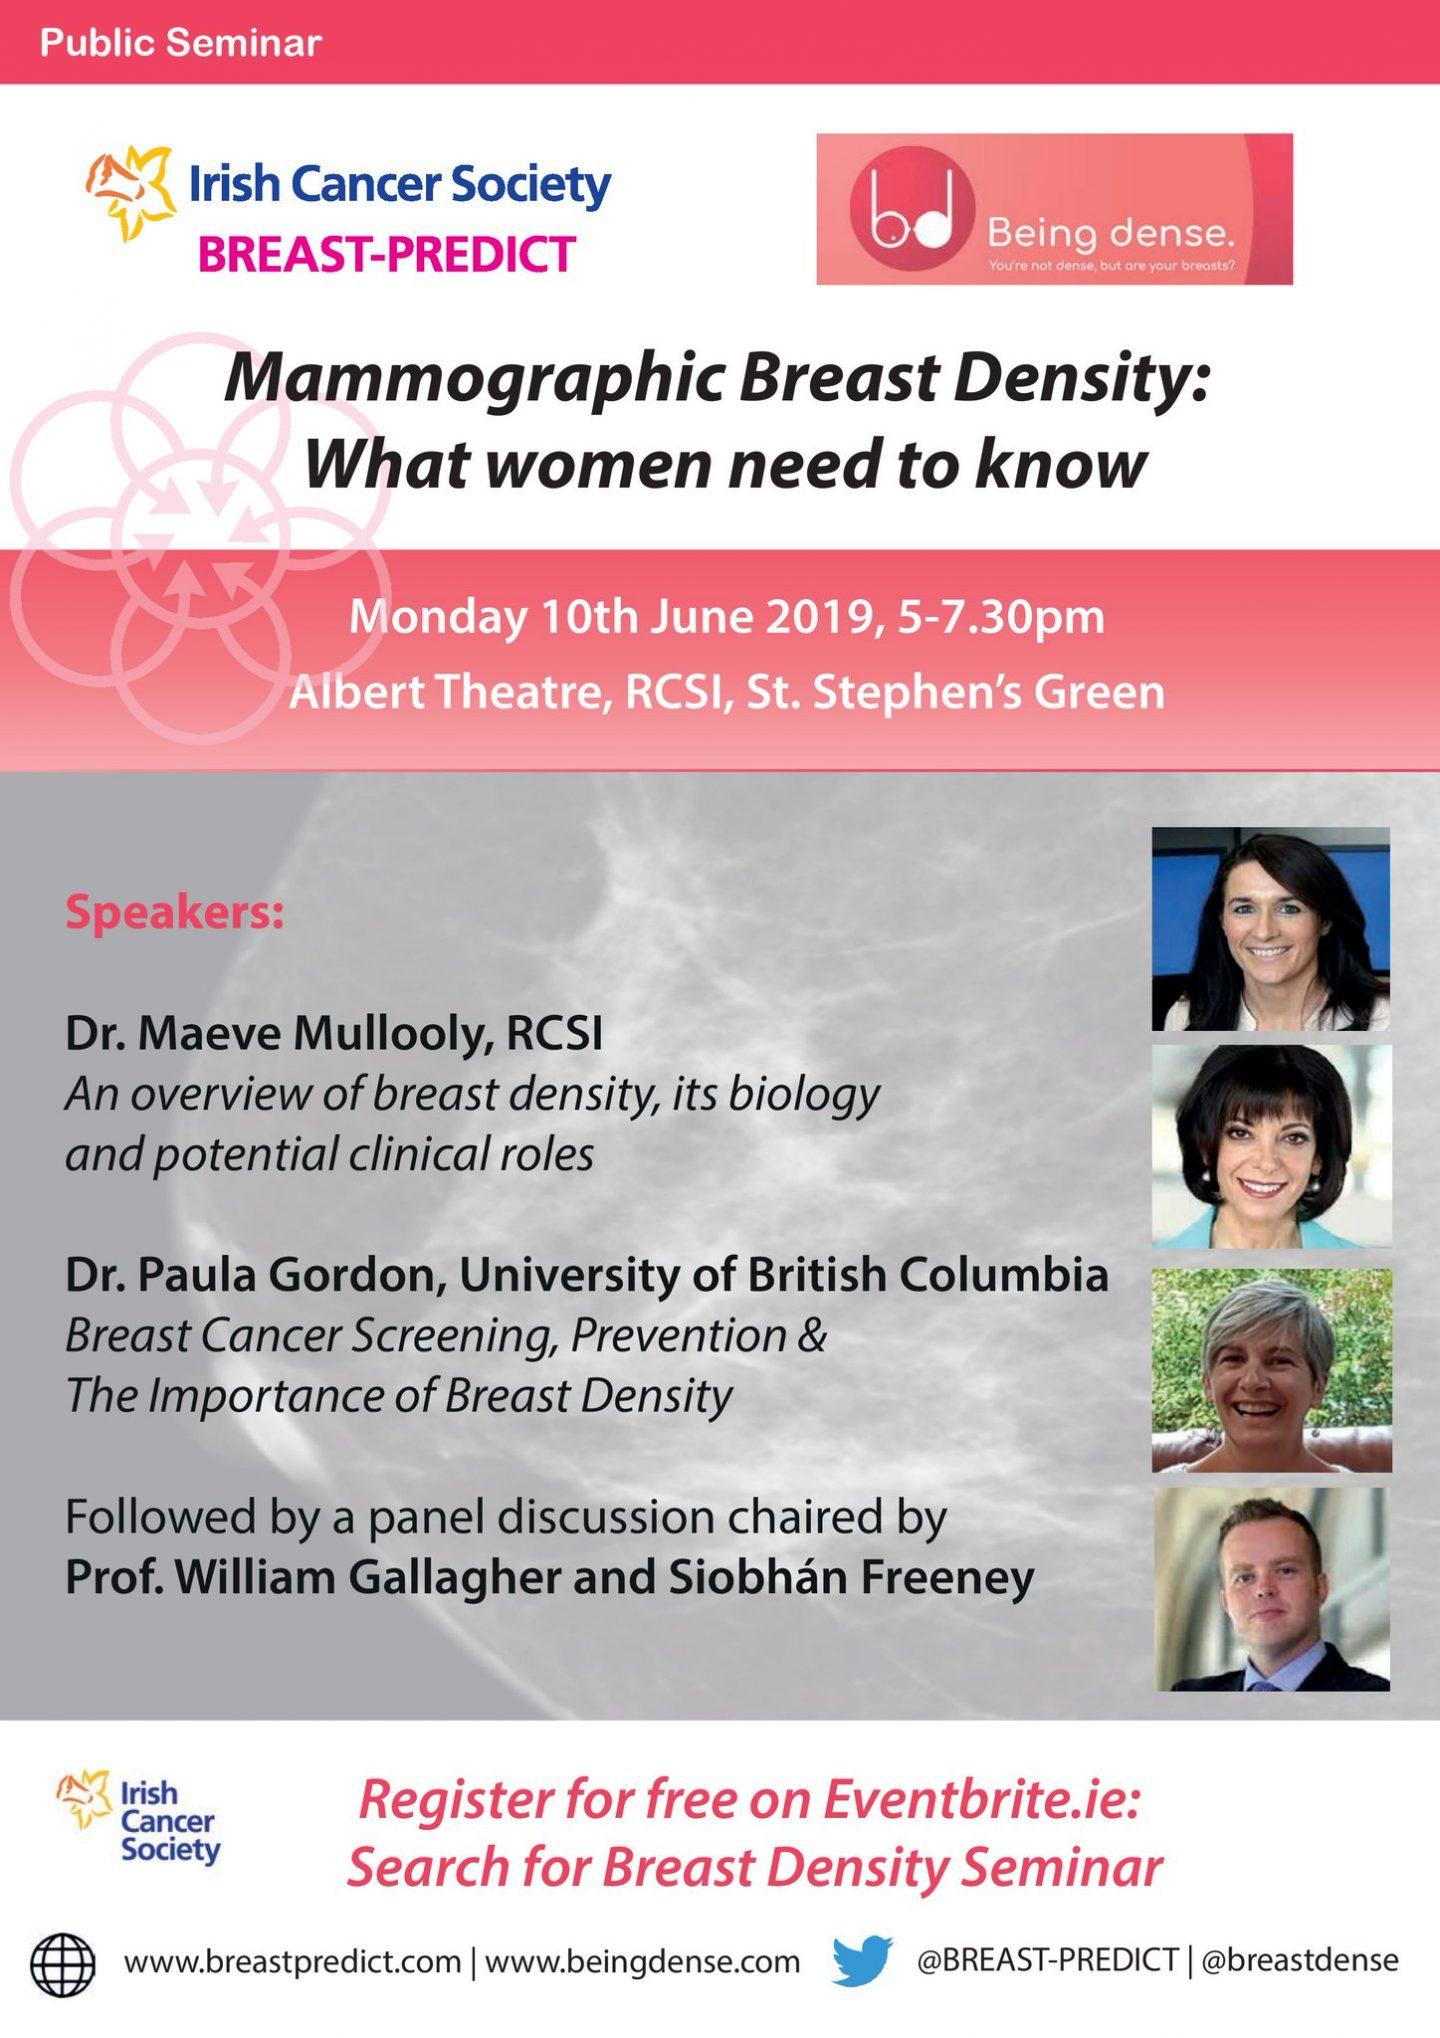 Public talk on mammographic breast density